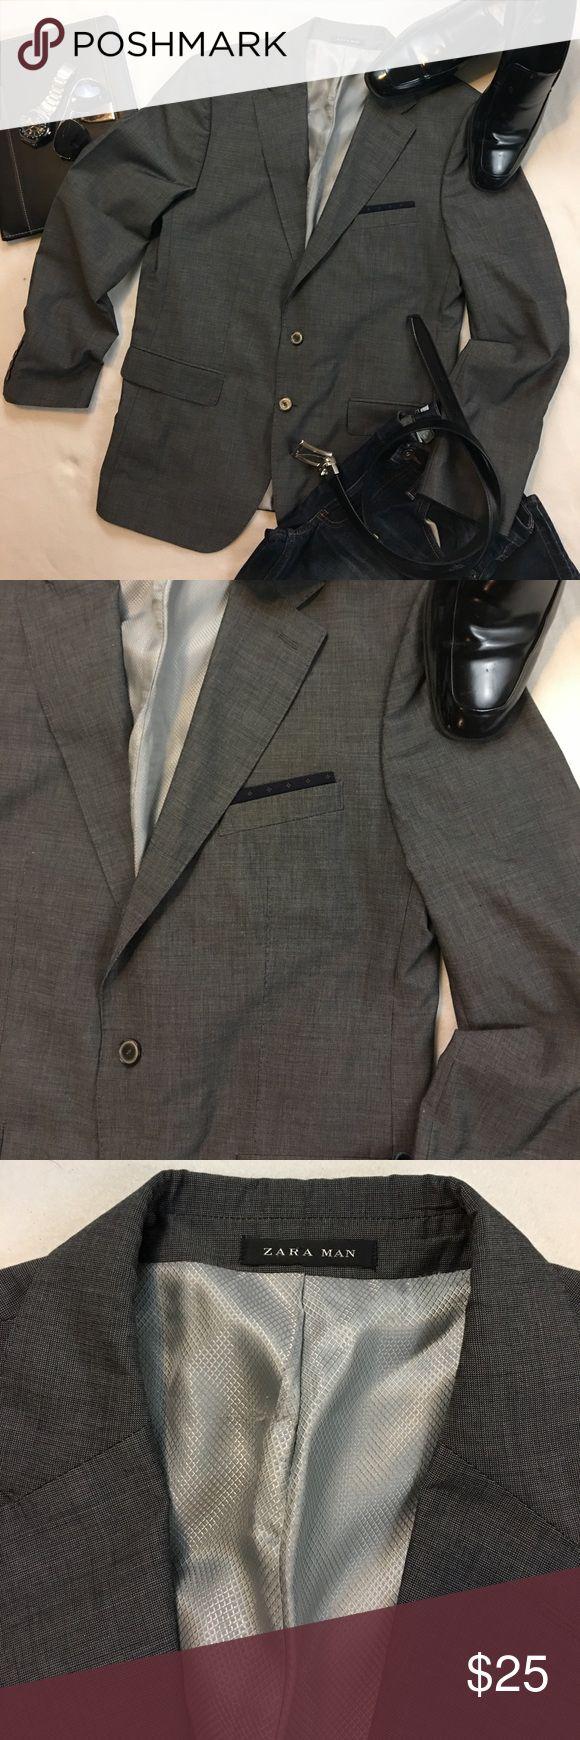 Zara Men 2 Button Blazer Sportcoat Jacket Zara Men 2 Button Fully lined double back vent blazer sportcoat jacket, gray has top stitching around lapel and pockets front pocket handkerchief detail Zara Jackets & Coats